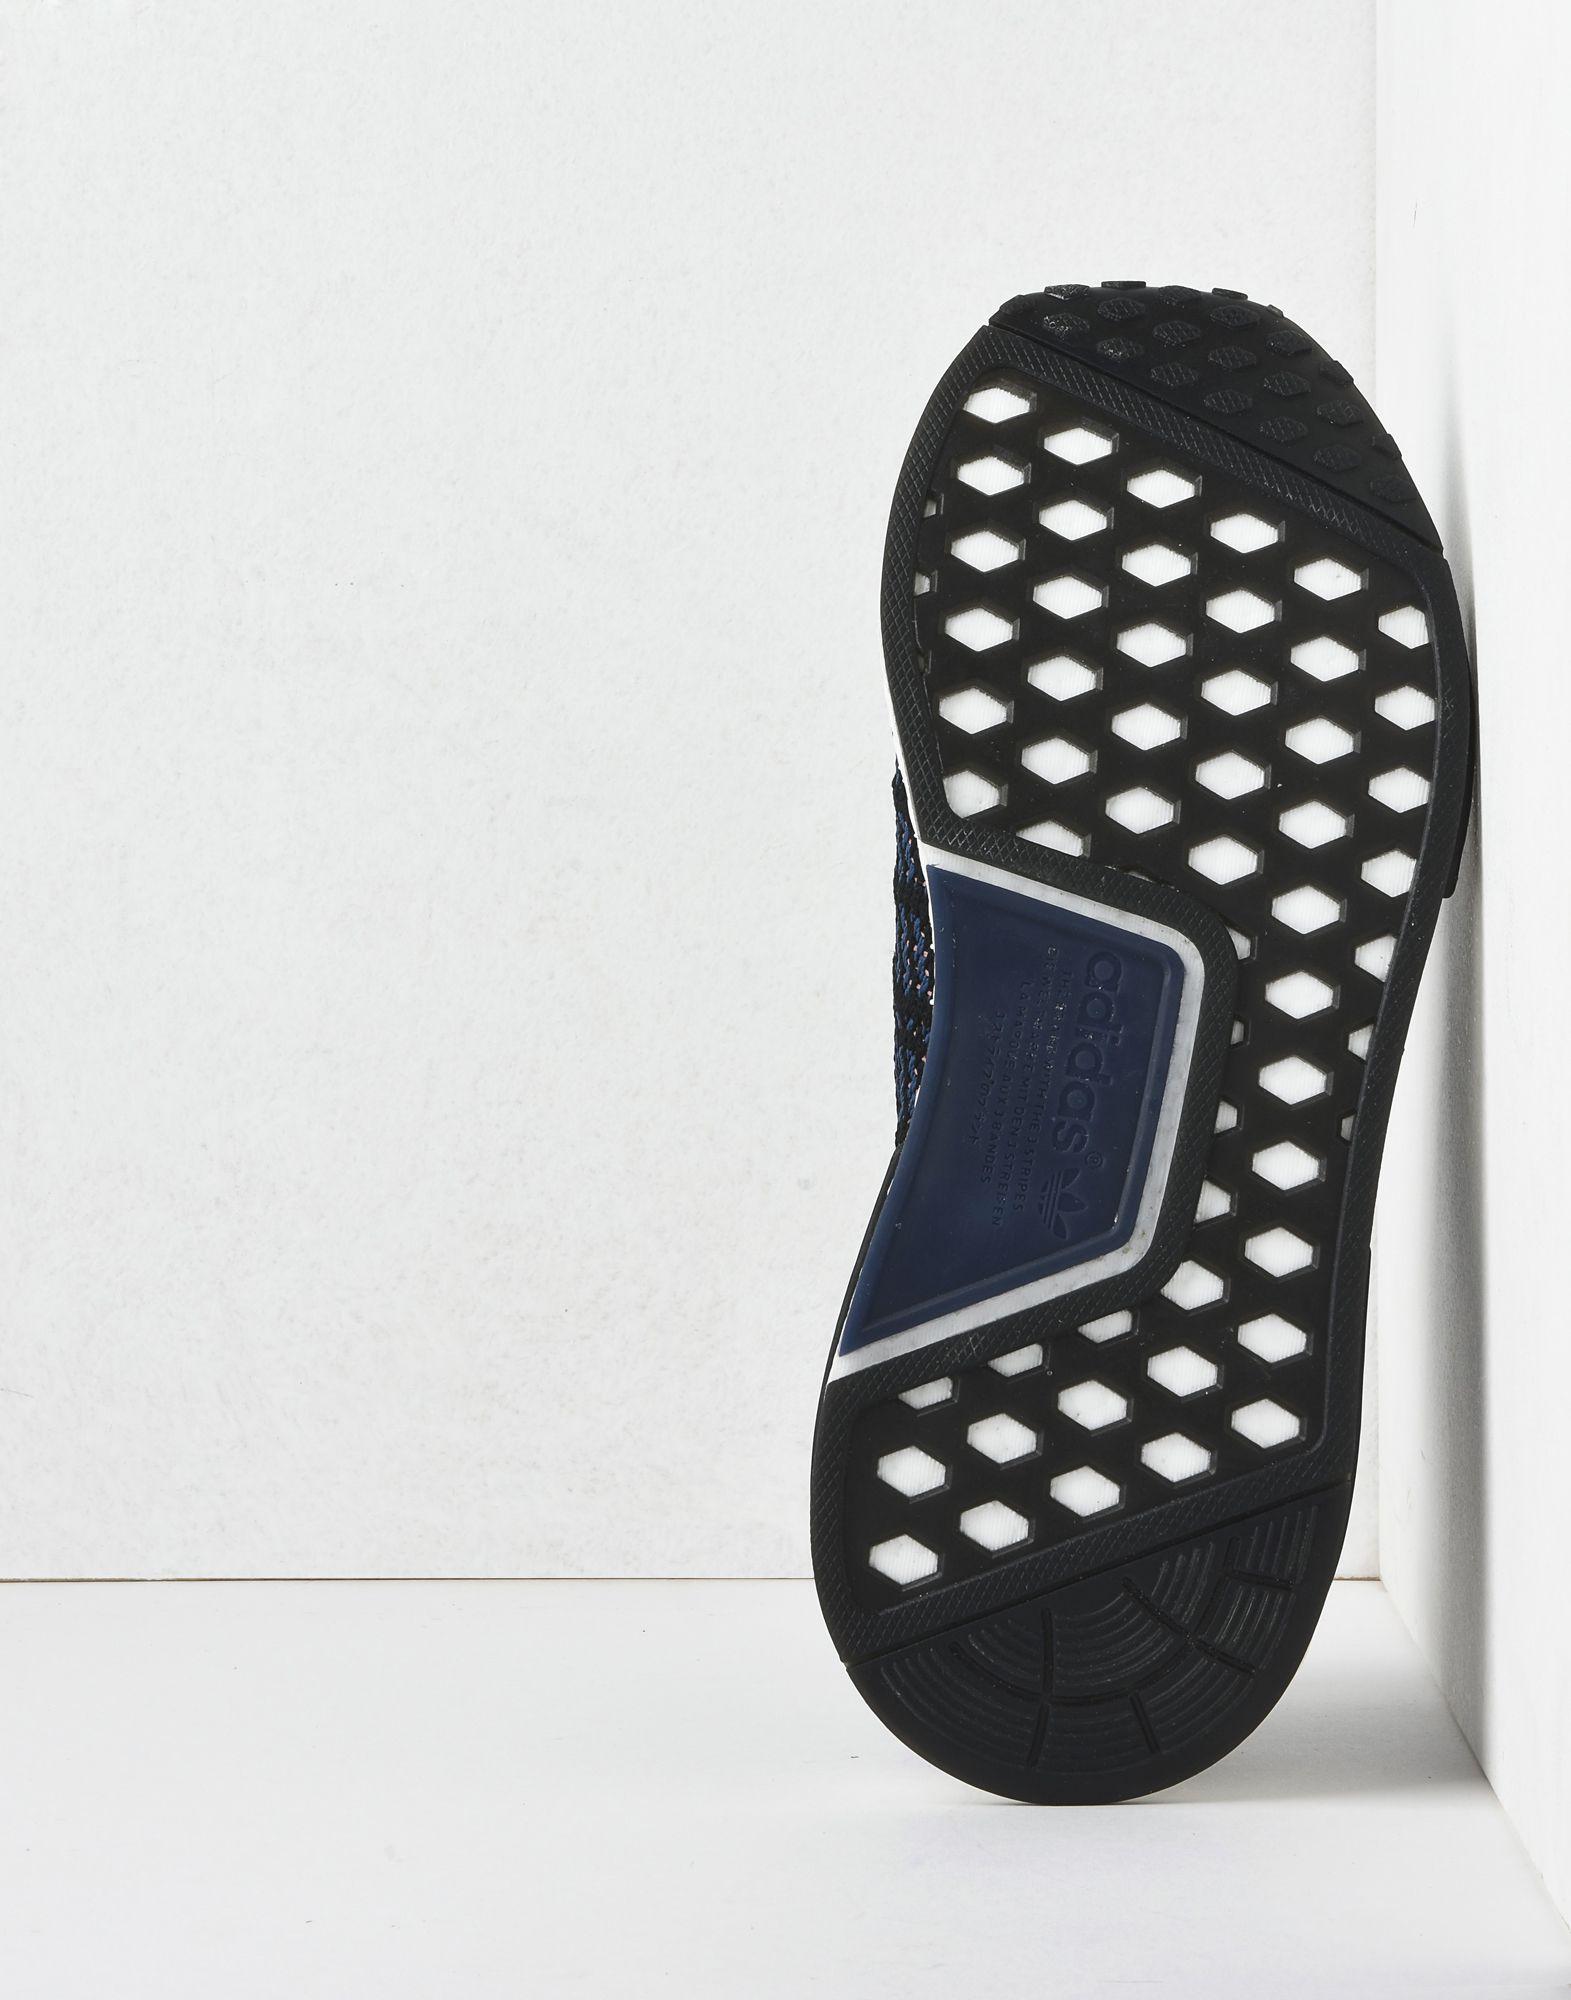 Gut Stlt um billige Schuhe zu tragenAdidas Originals Nmd_R1 Stlt Gut Pk W  11435346EK 195cf0